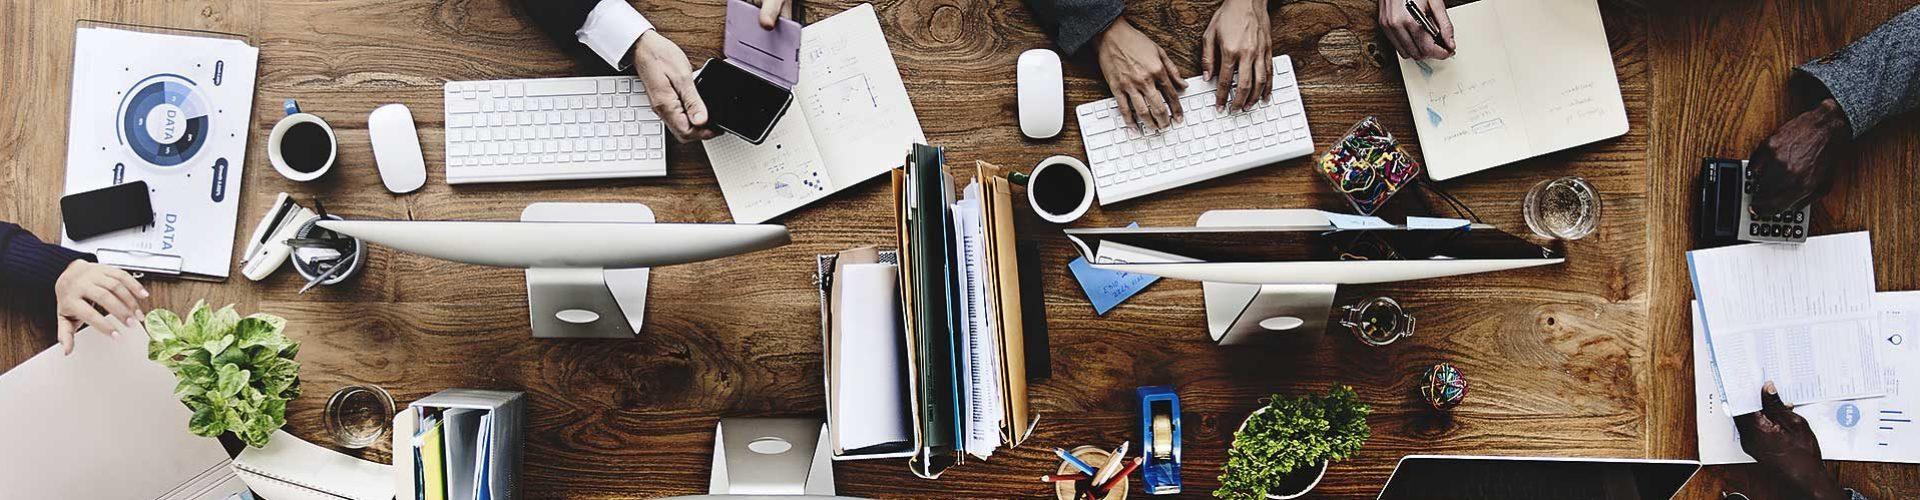 Lønfeldt Marketing kompetenceområder indenfor markedsføring